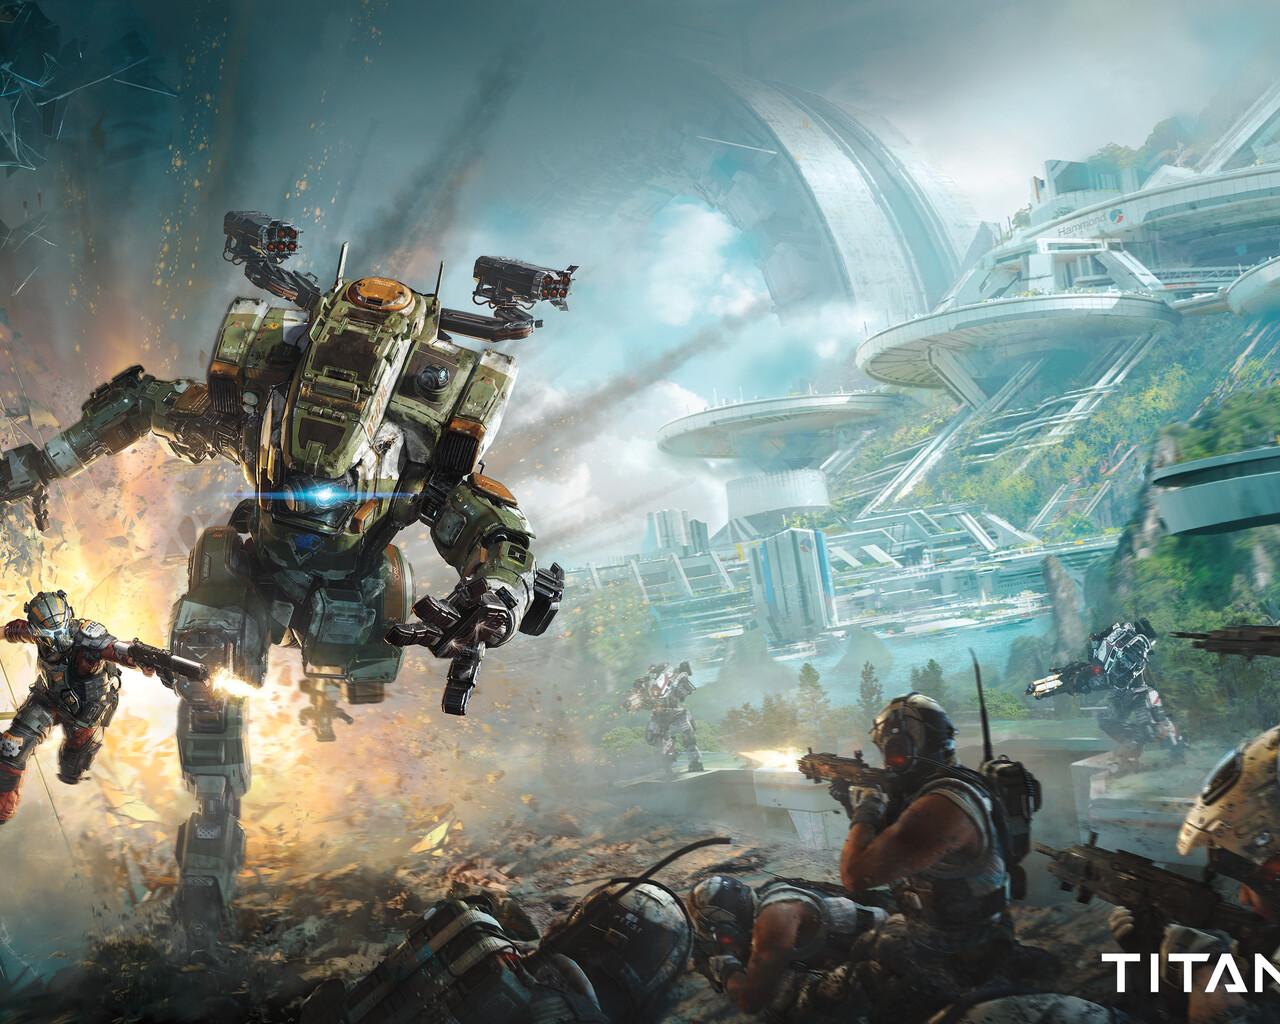 23 best Titanfall images on Pinterest   Videogames, Concept art ...